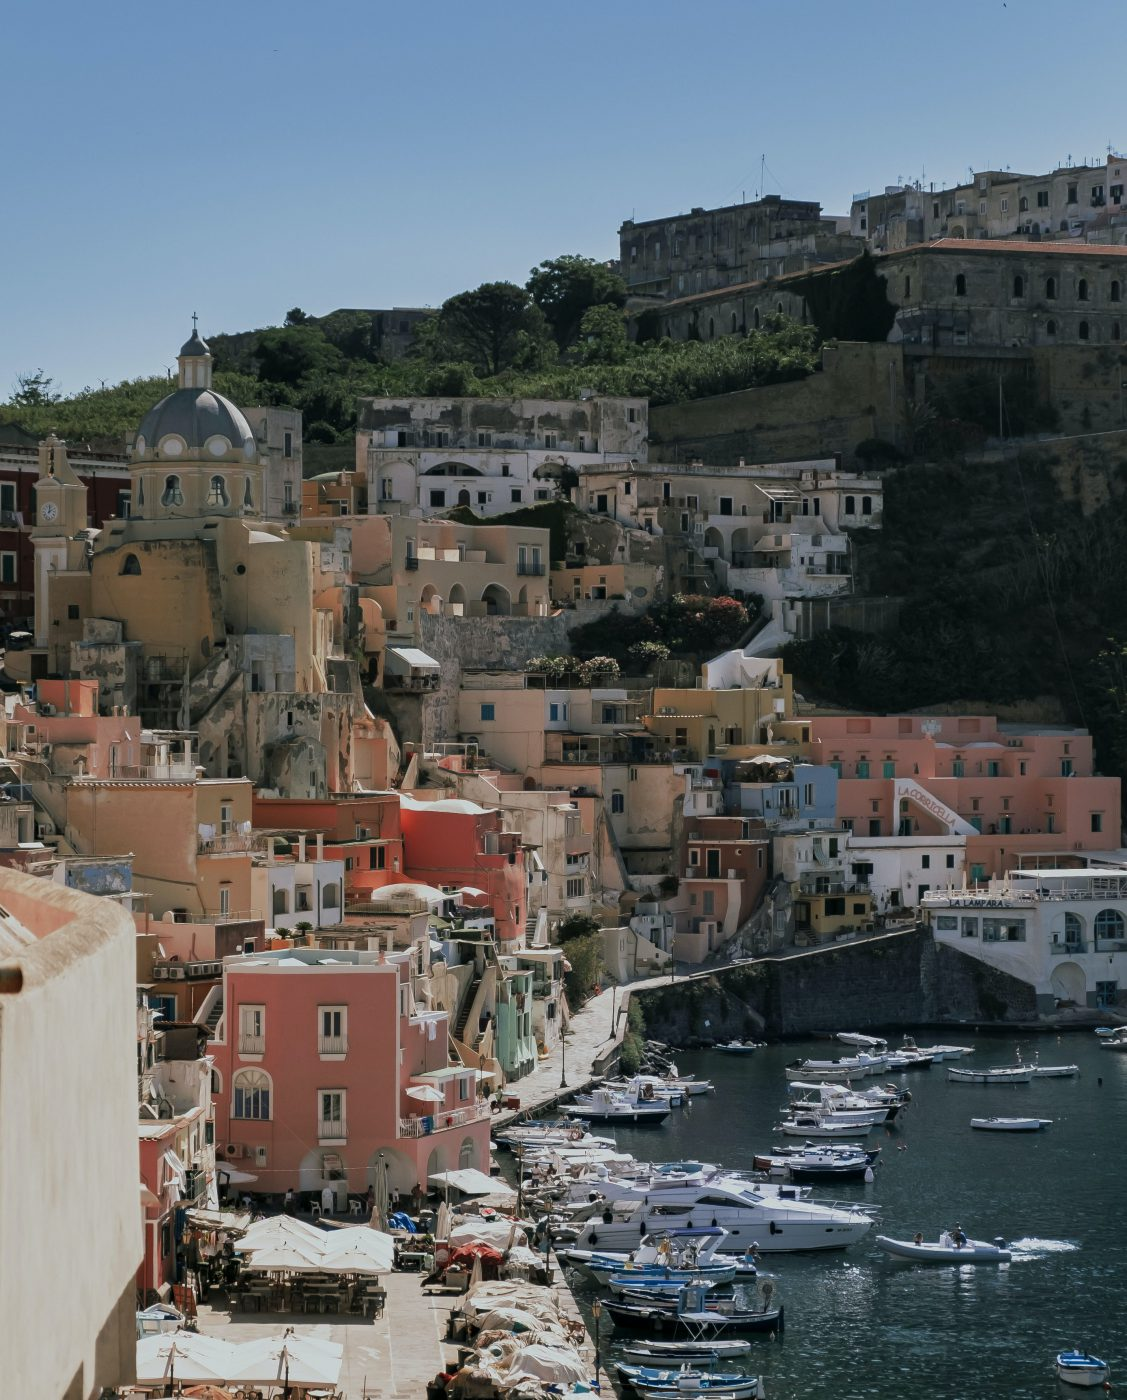 The Allure of the Pastel Palette Island - Procida Campania